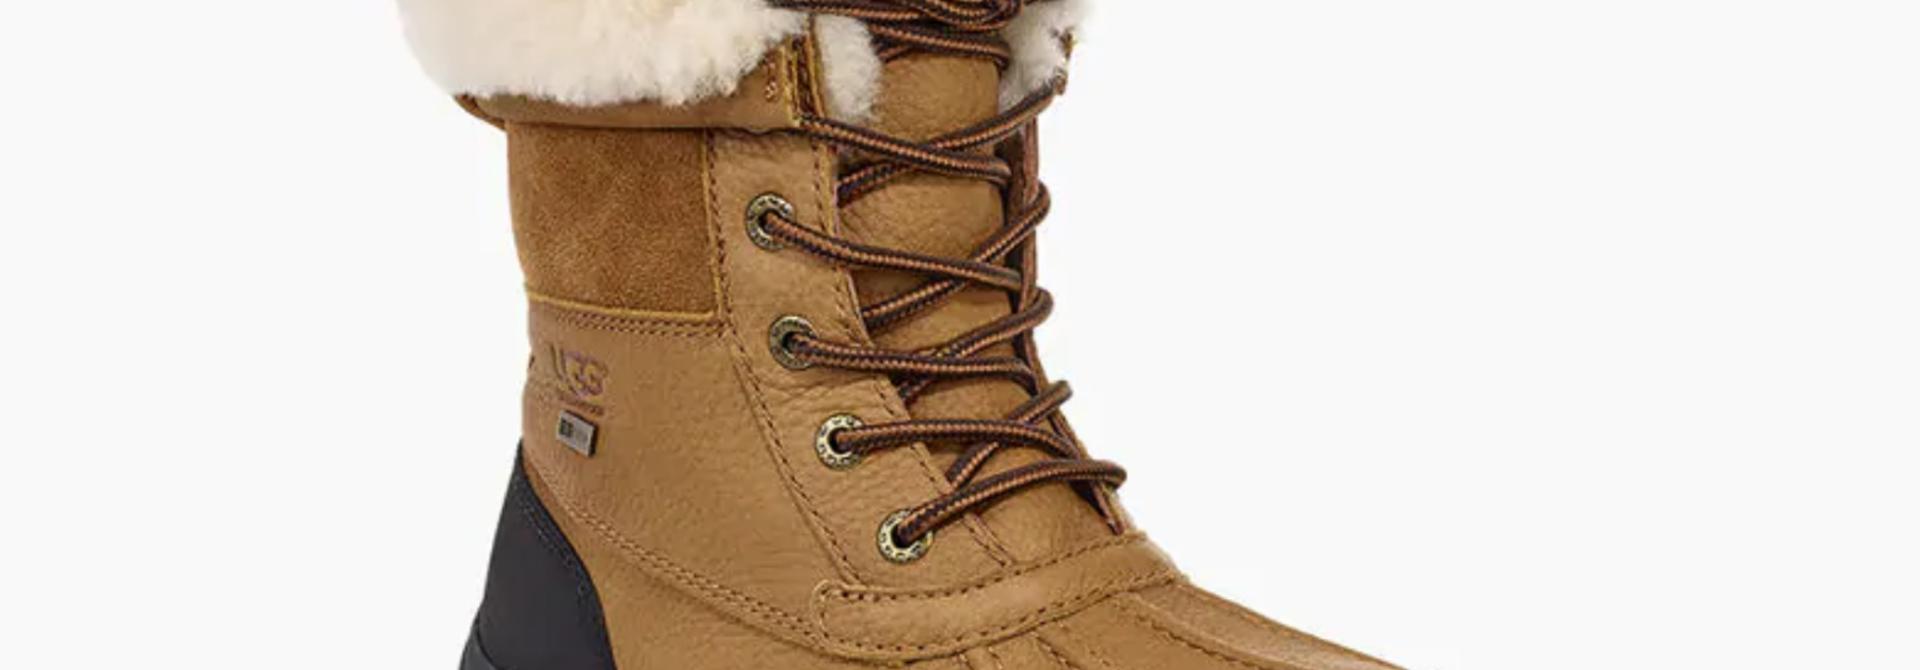 Women's Adirondack Boot III W